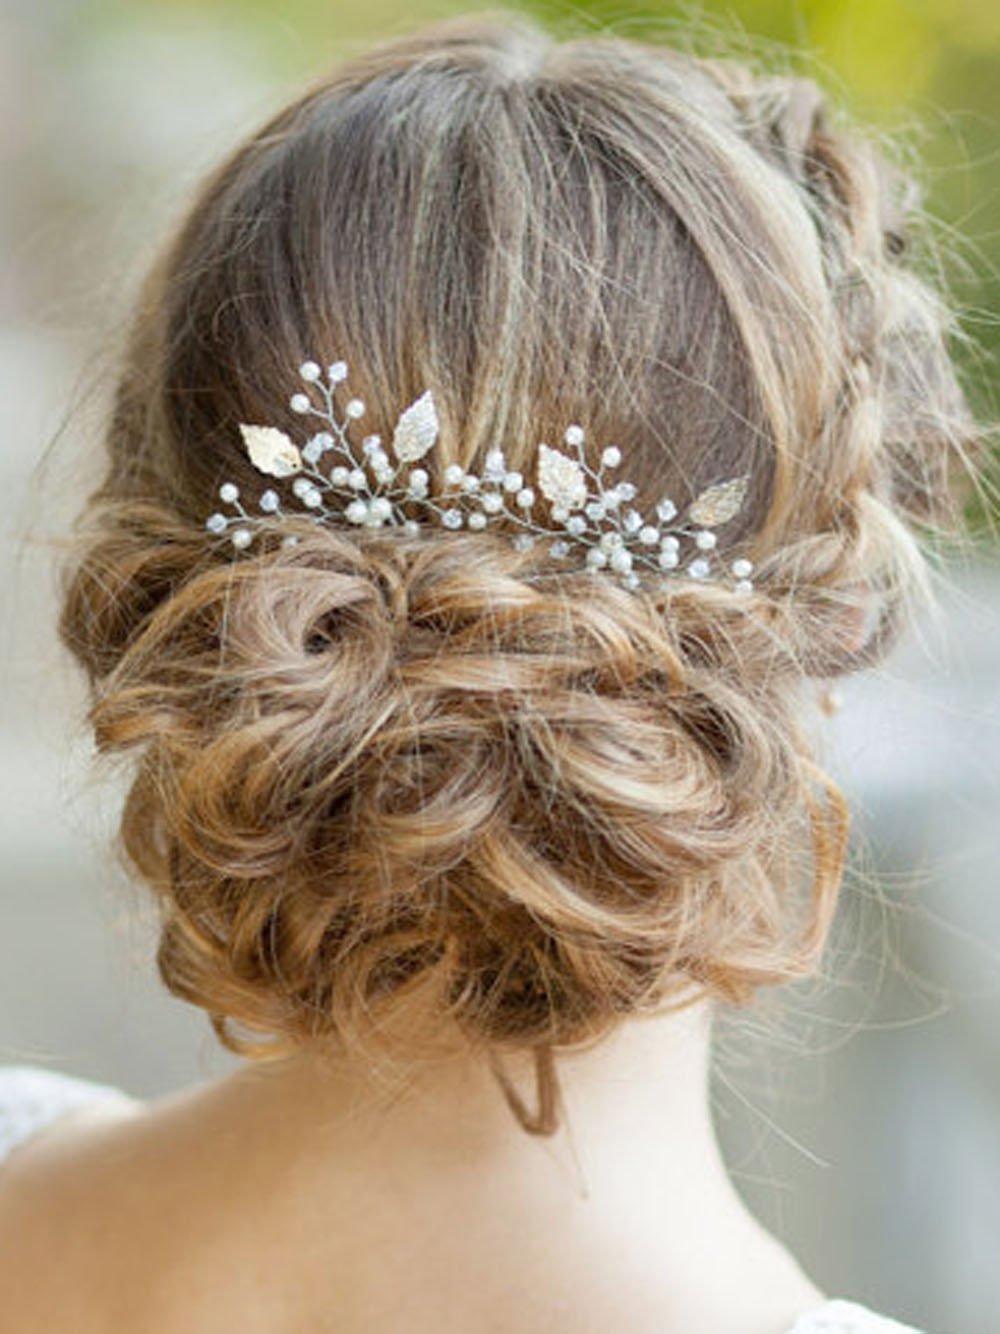 Yean Silver Bridal Hair Pins Set, Wedding Leaf Hair Pin for Women and Girls (Set of 2) (Silver)